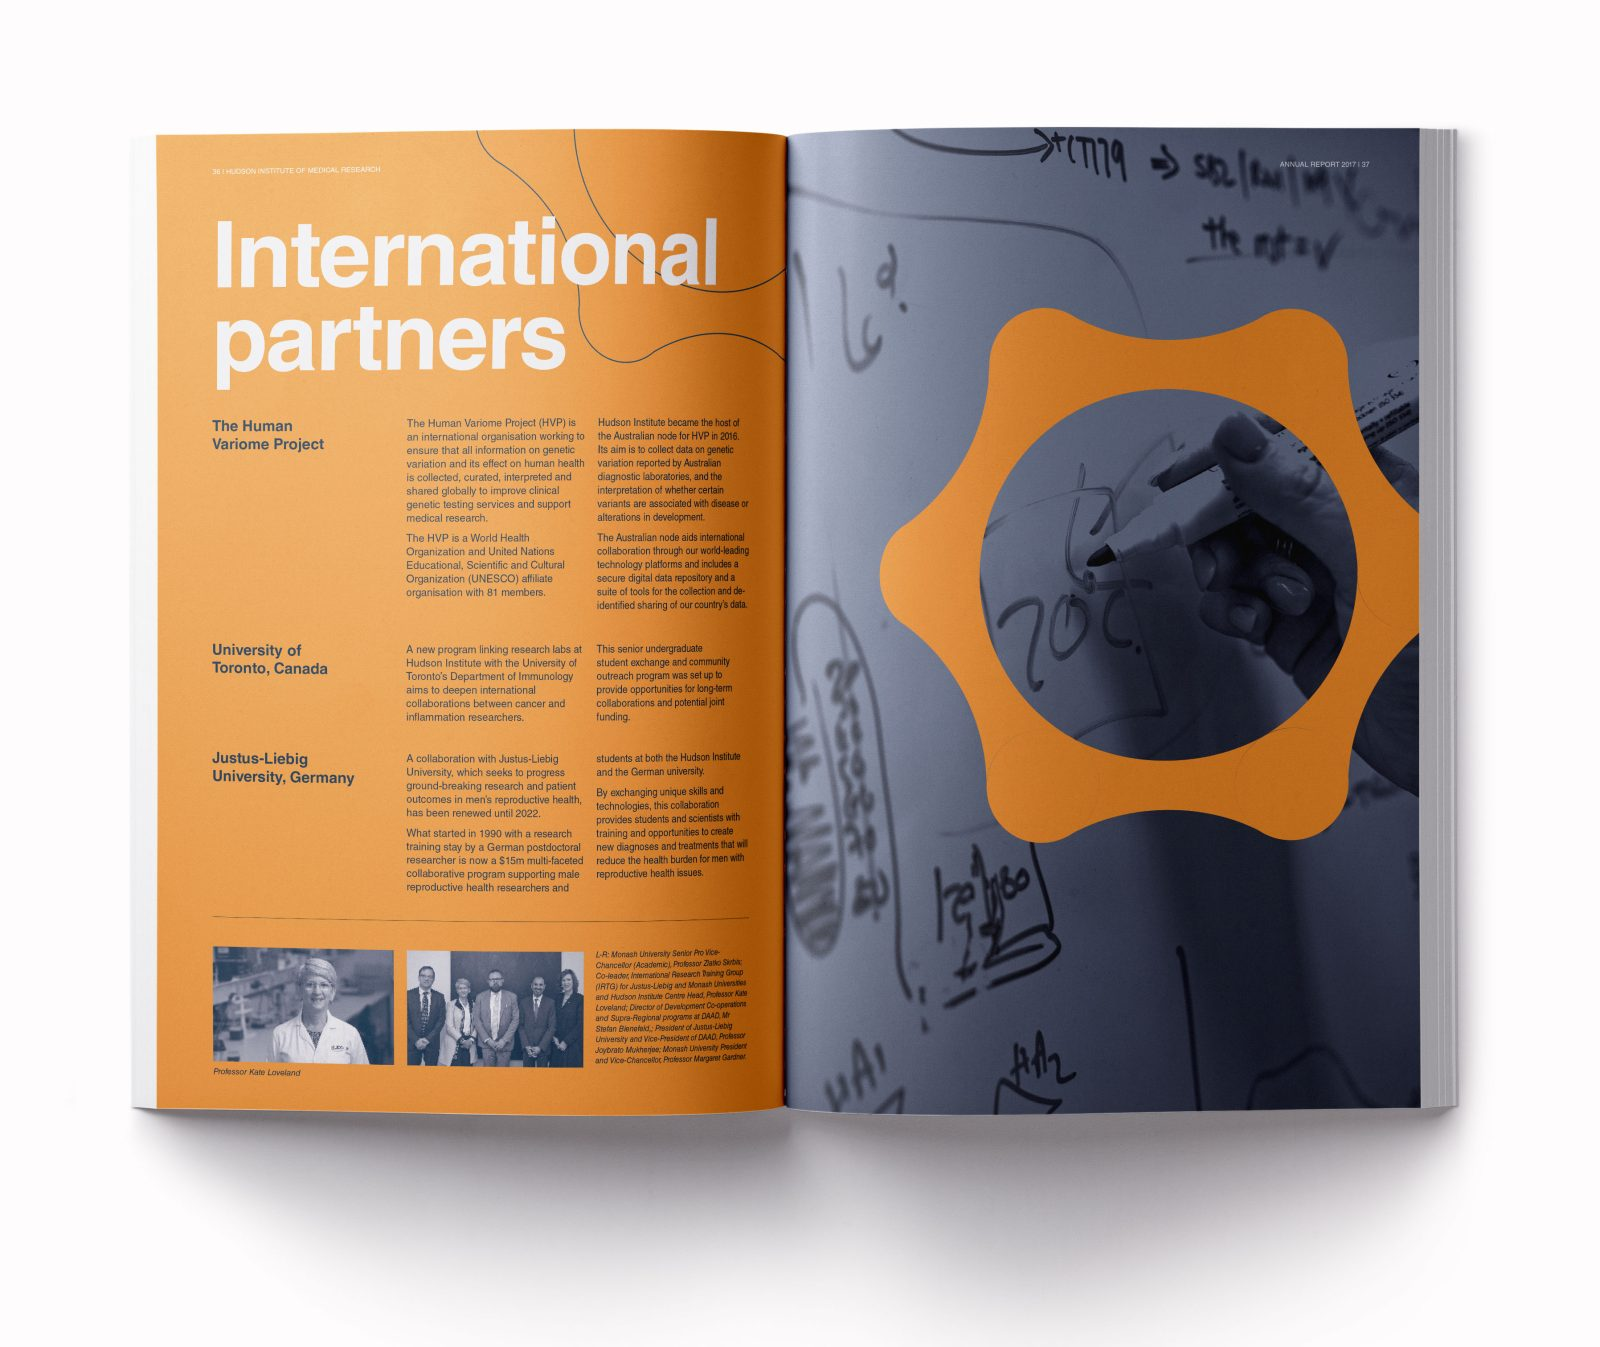 Hudson Institure annual report international partners spread